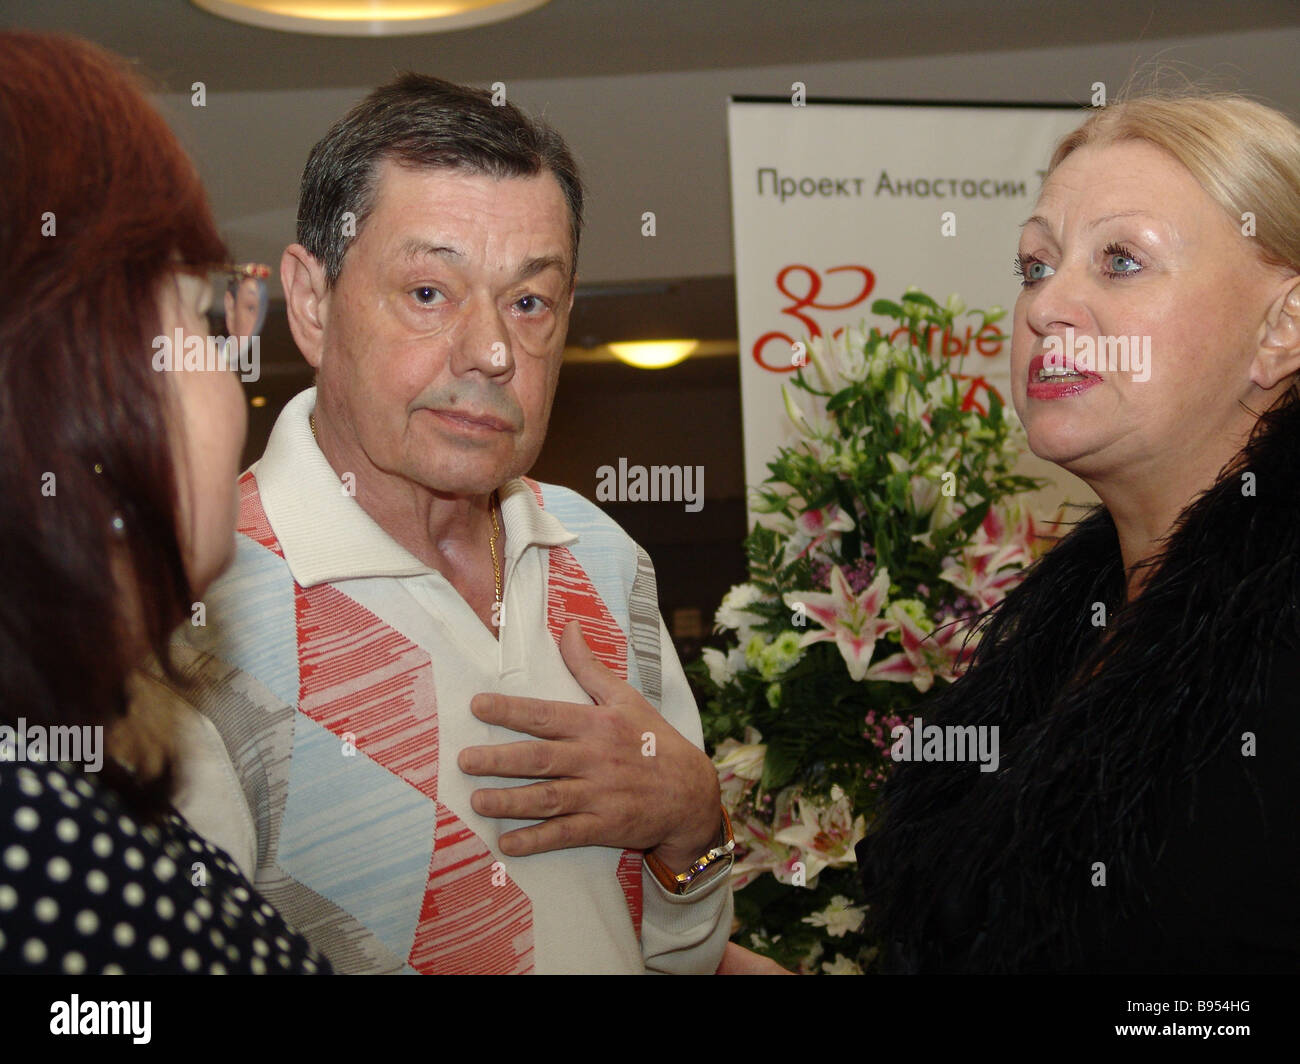 Lyudmila Porgina told about the serious illness of Karachentsov 19.04.2017 27